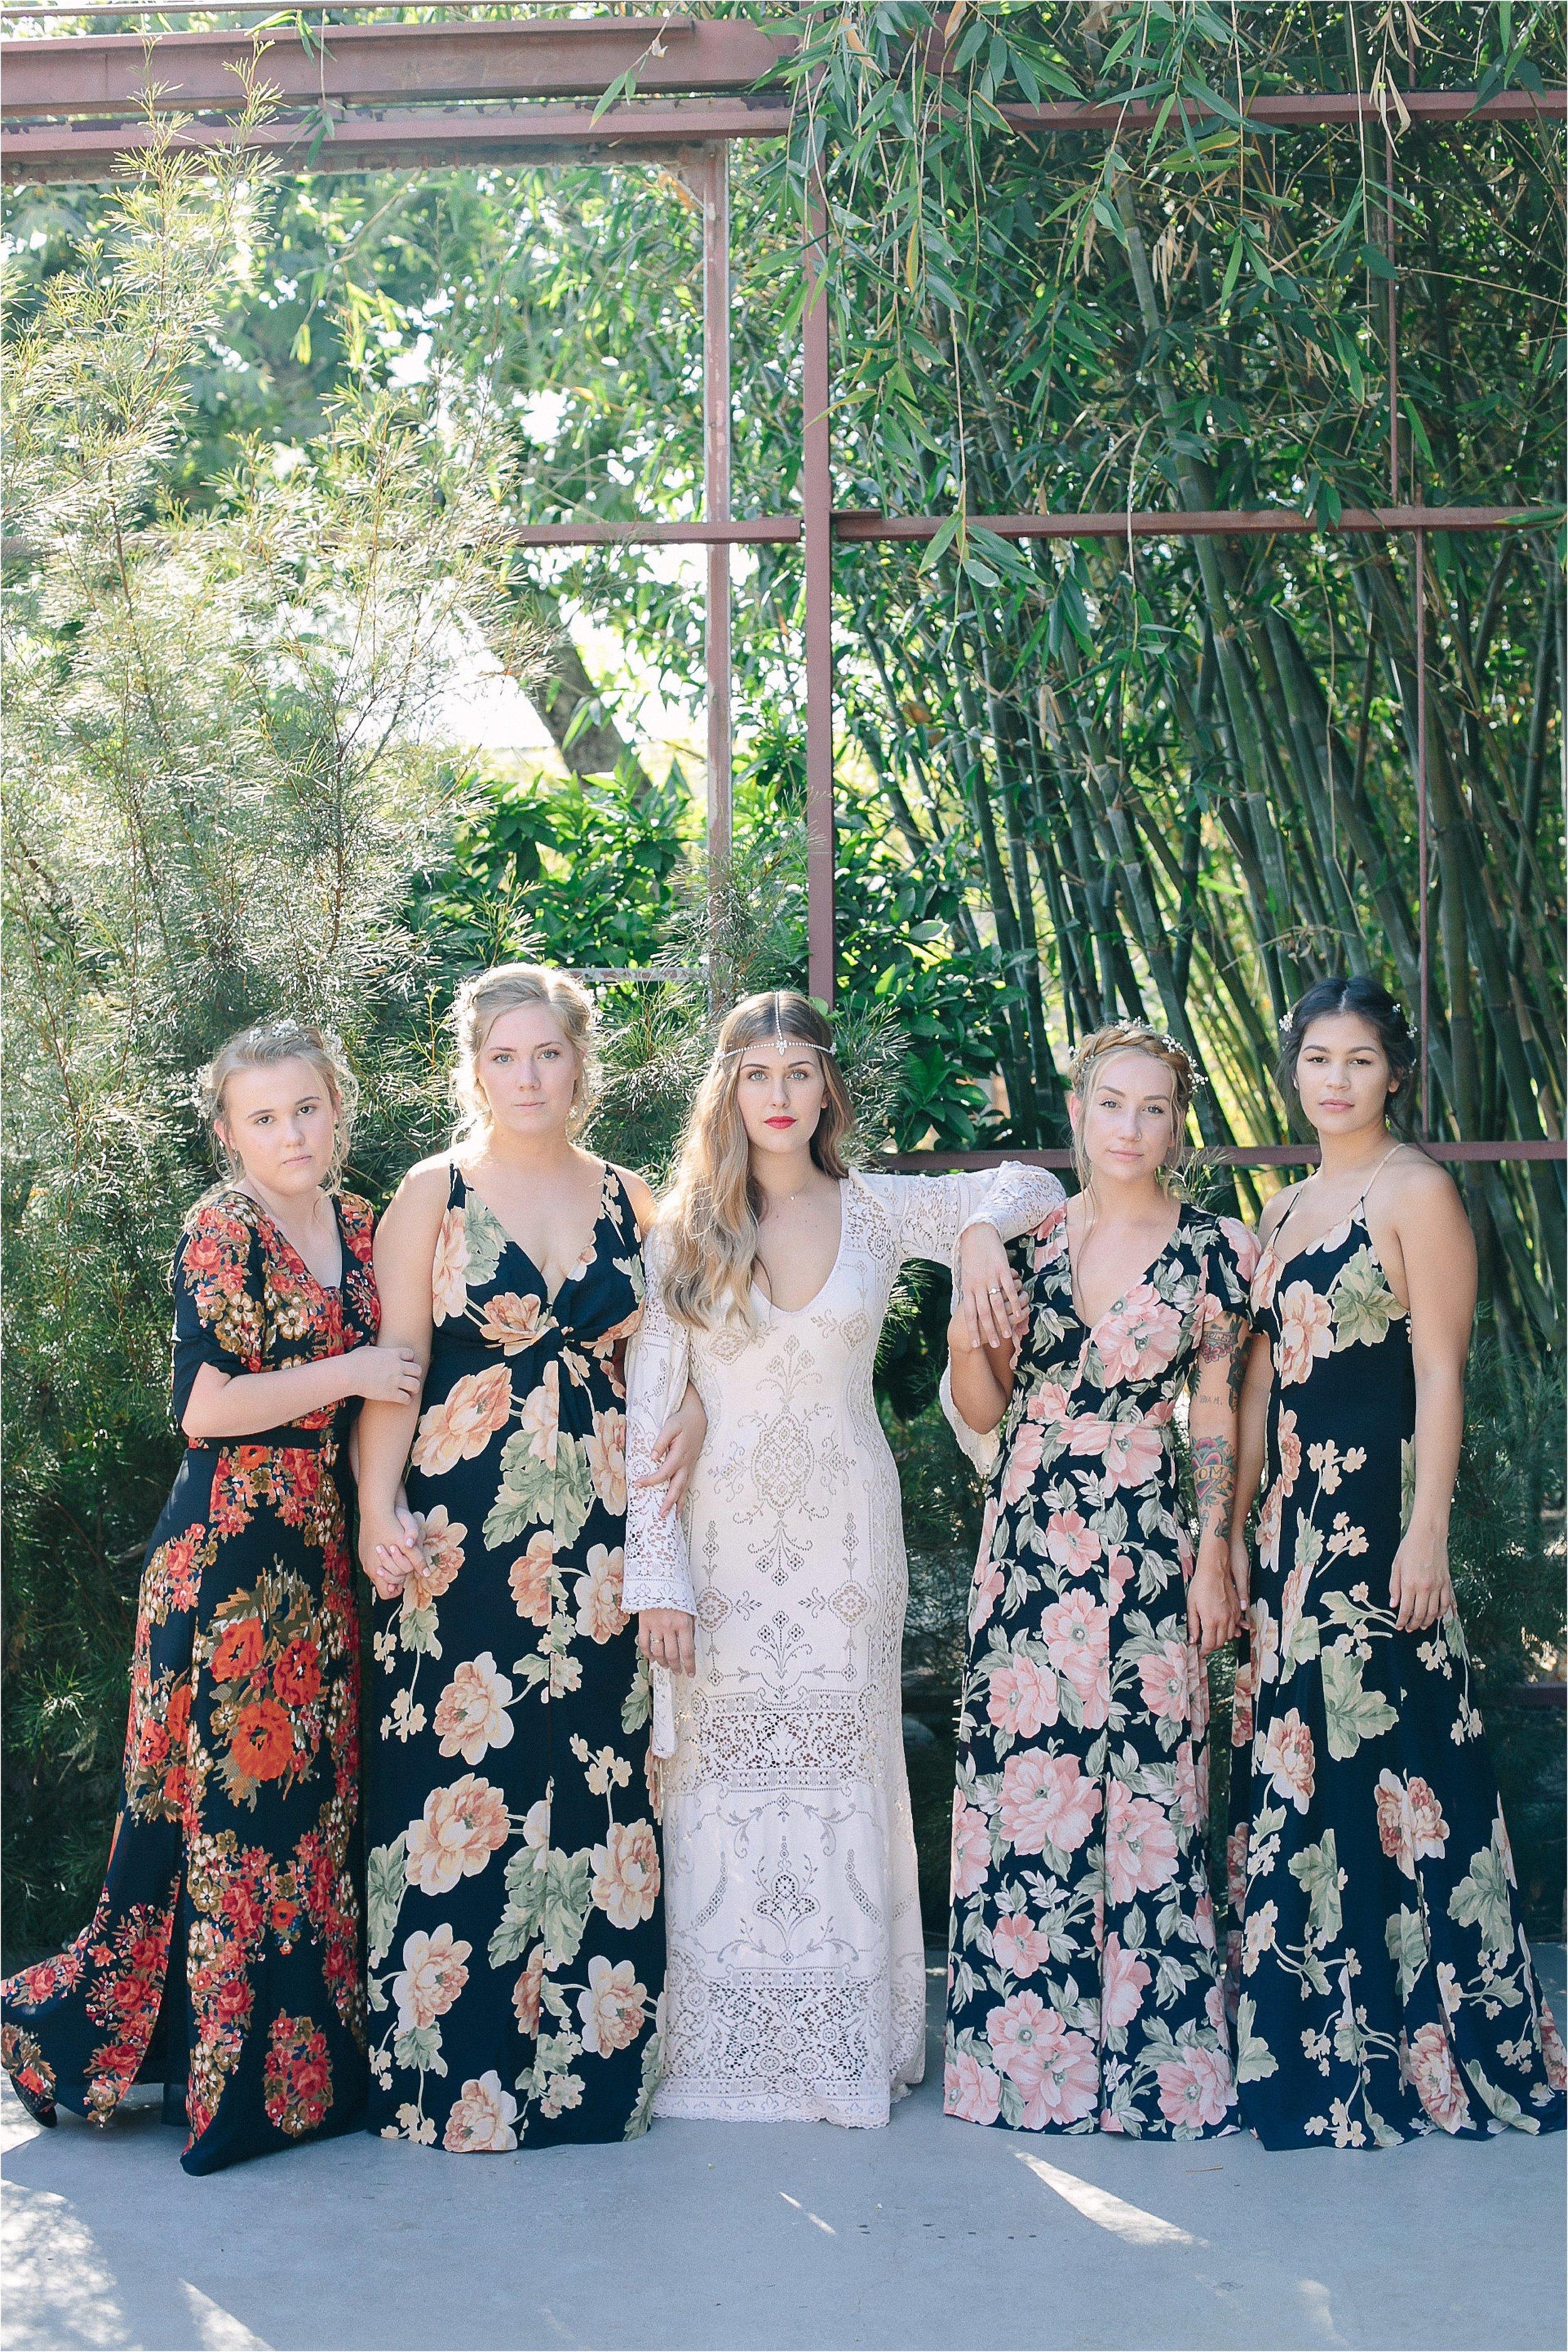 Gorgeous Bride & Bridesmaids in perfect golden light